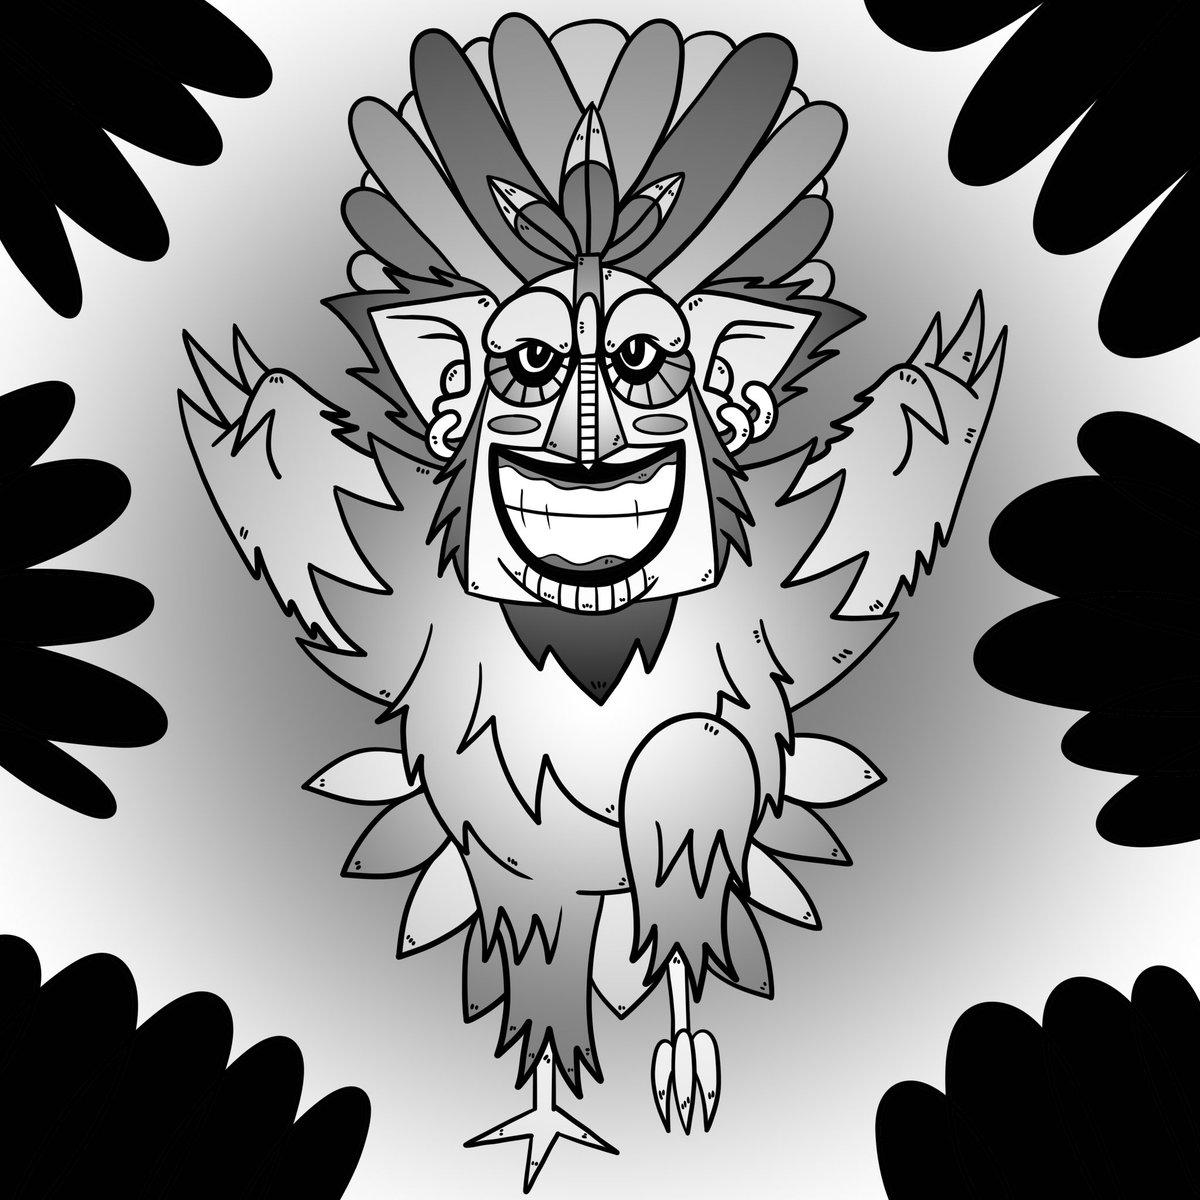 #inktober #inktober2020 #music #música #pokemon #pokedex #digimon #digitalart #characterdesign #character #drawing #drawings #draw #dibujo #dibujos #videogames #videogame #comic #comics #comicart #manga #creature #creatures #monster #monsters #divertido #halloween #halloween2020 https://t.co/Qgy5uGCIyH